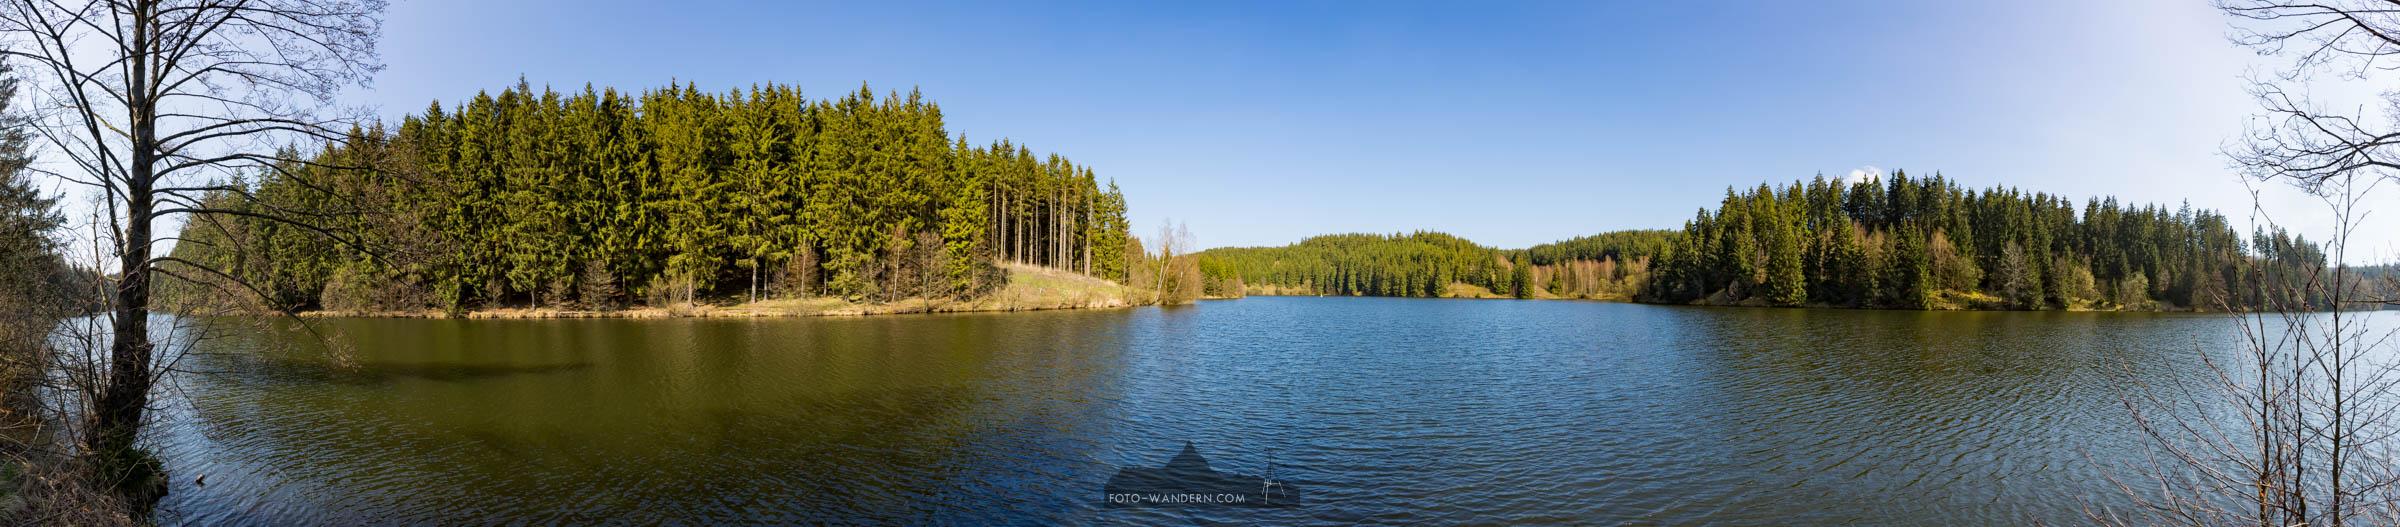 Panorama Rappbode-Vorsperre @ Andreas Levi - Foto-Wandernc.om